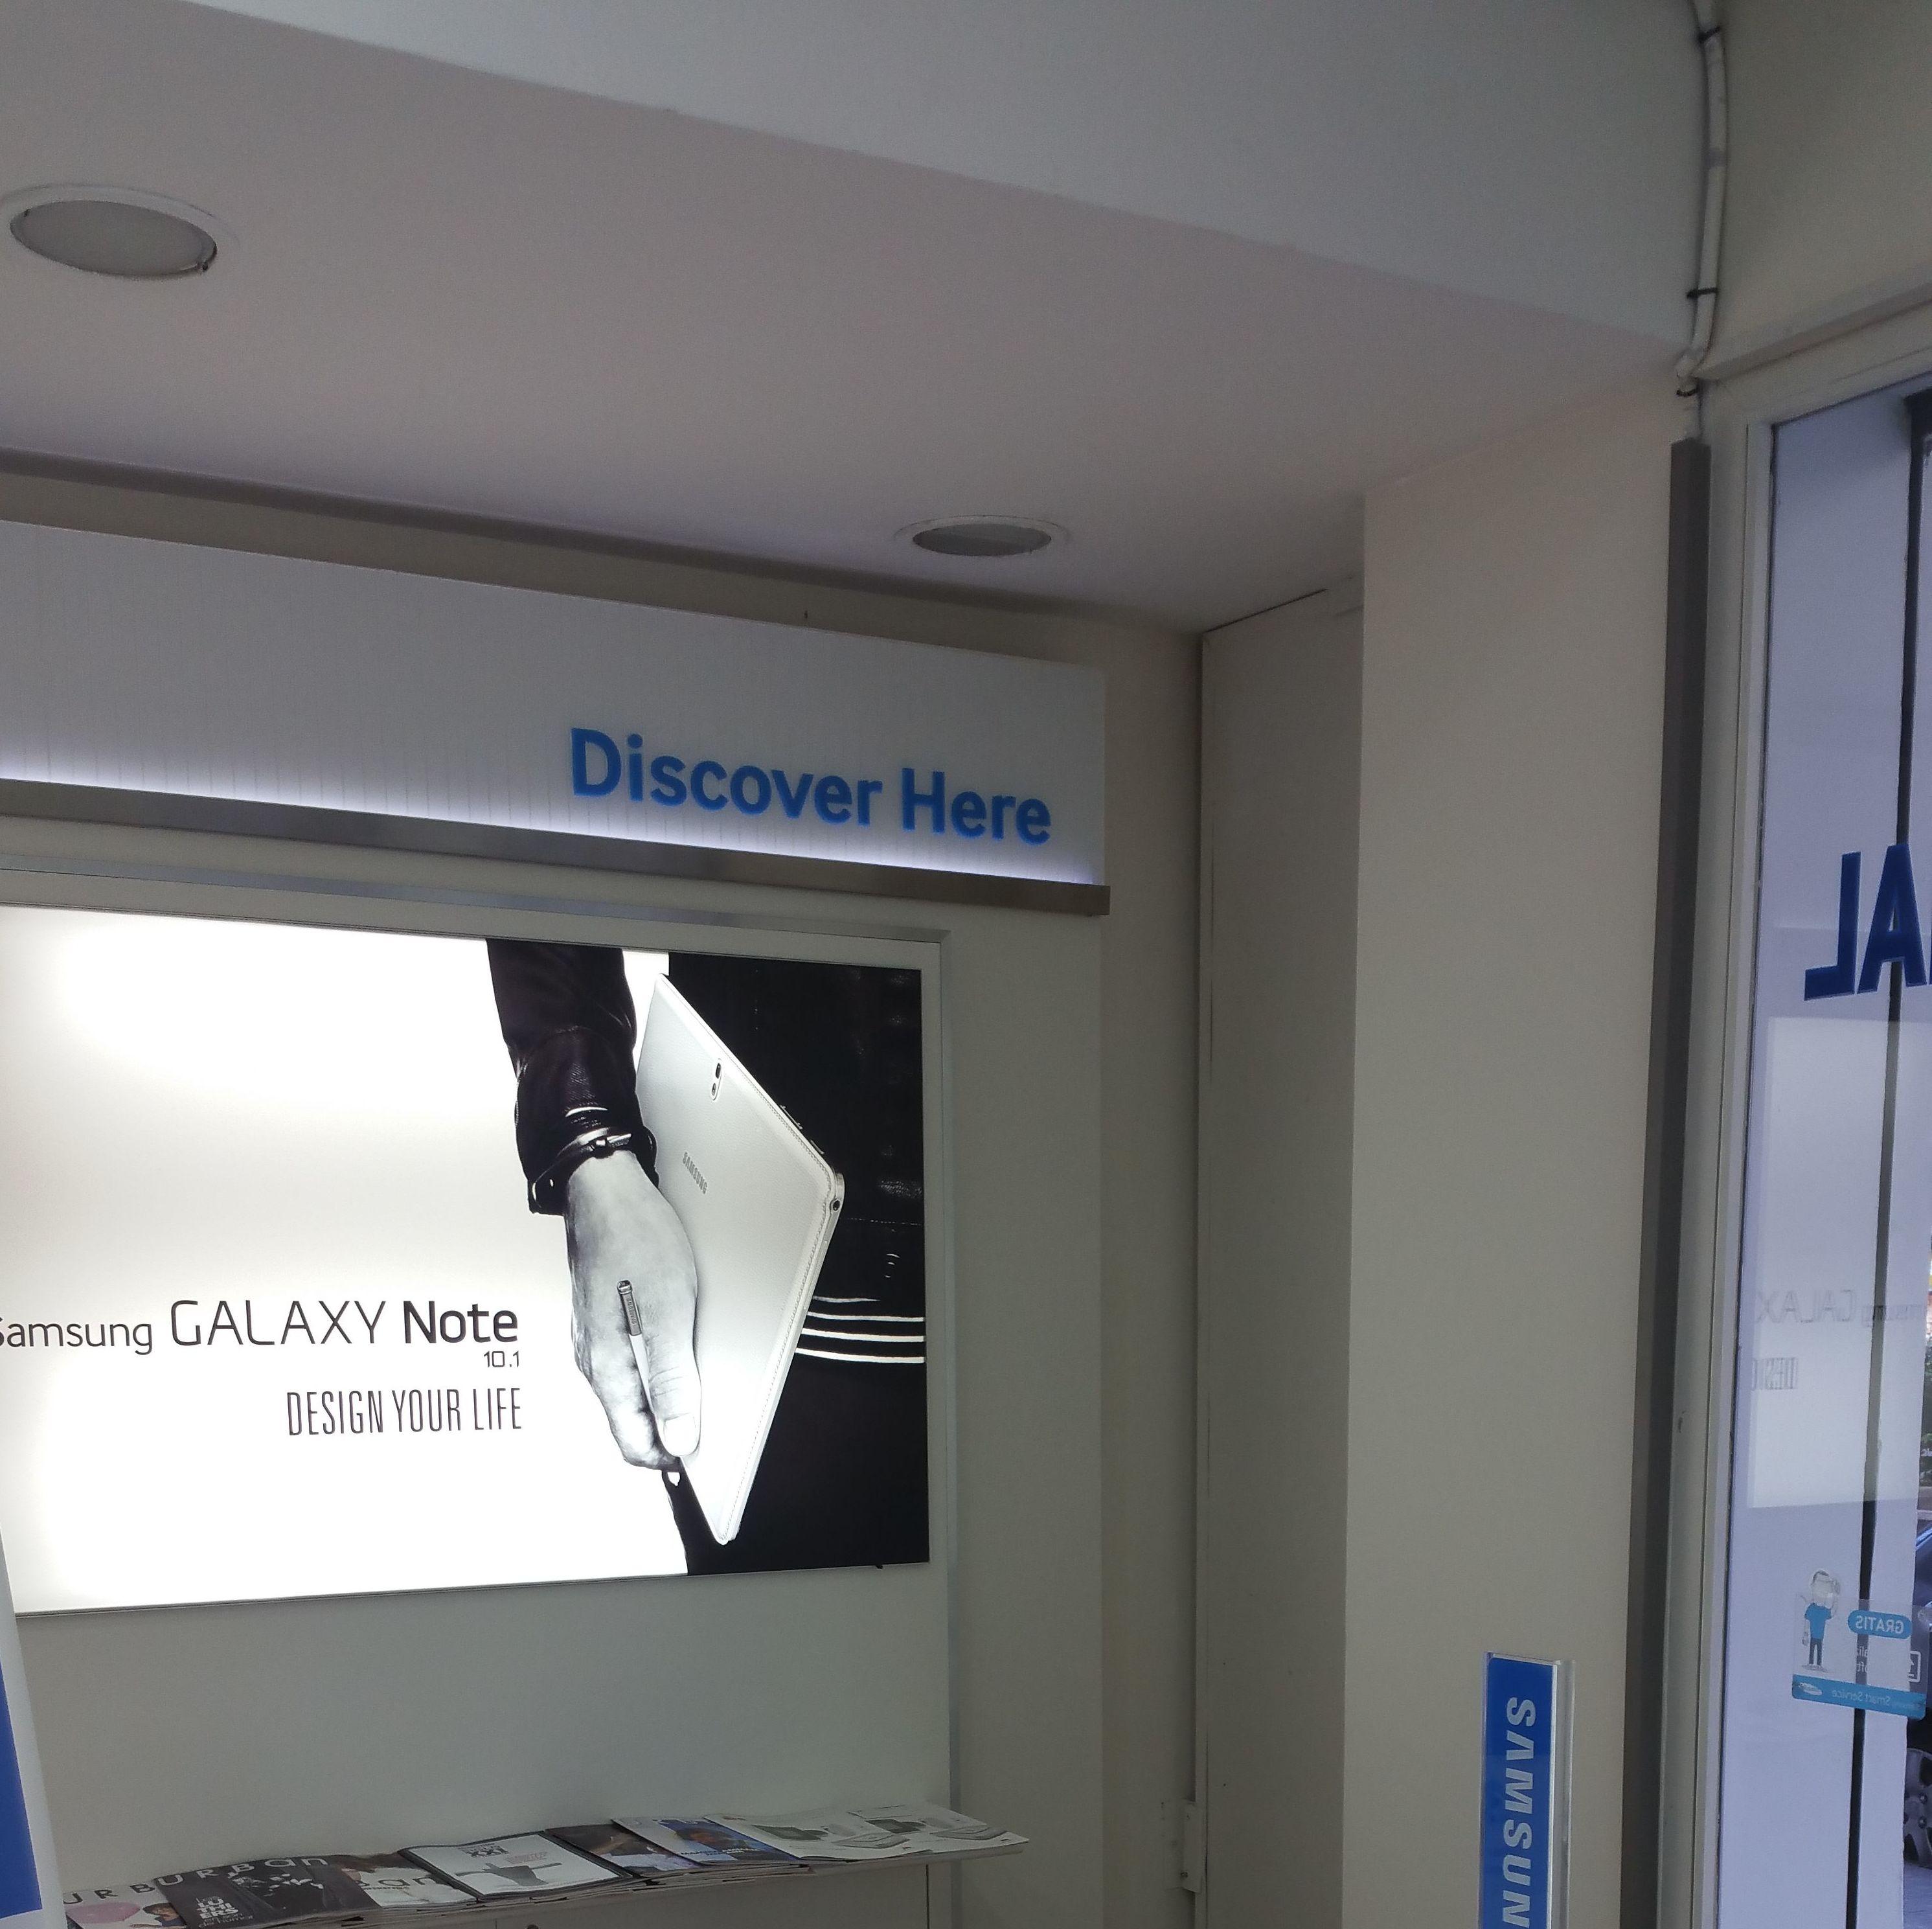 Asistencia técnica Samsung  en Valencia